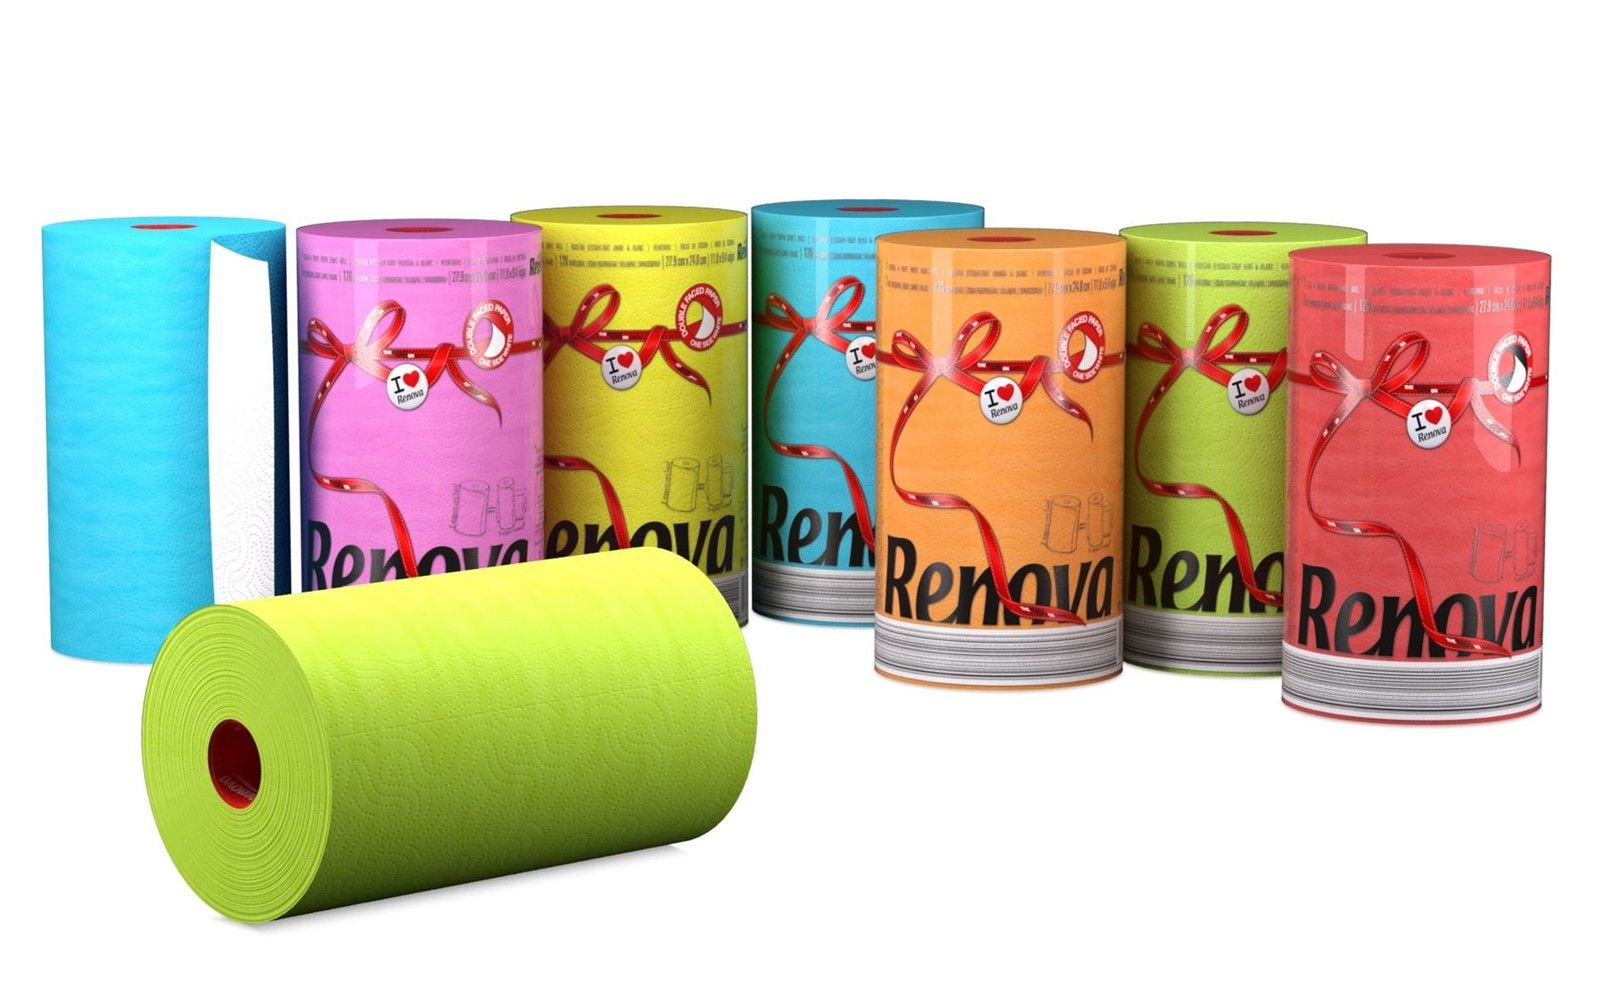 RENOVA Haushaltsrolle / Küchenrolle XXL 120 Blatt in versch. Farben